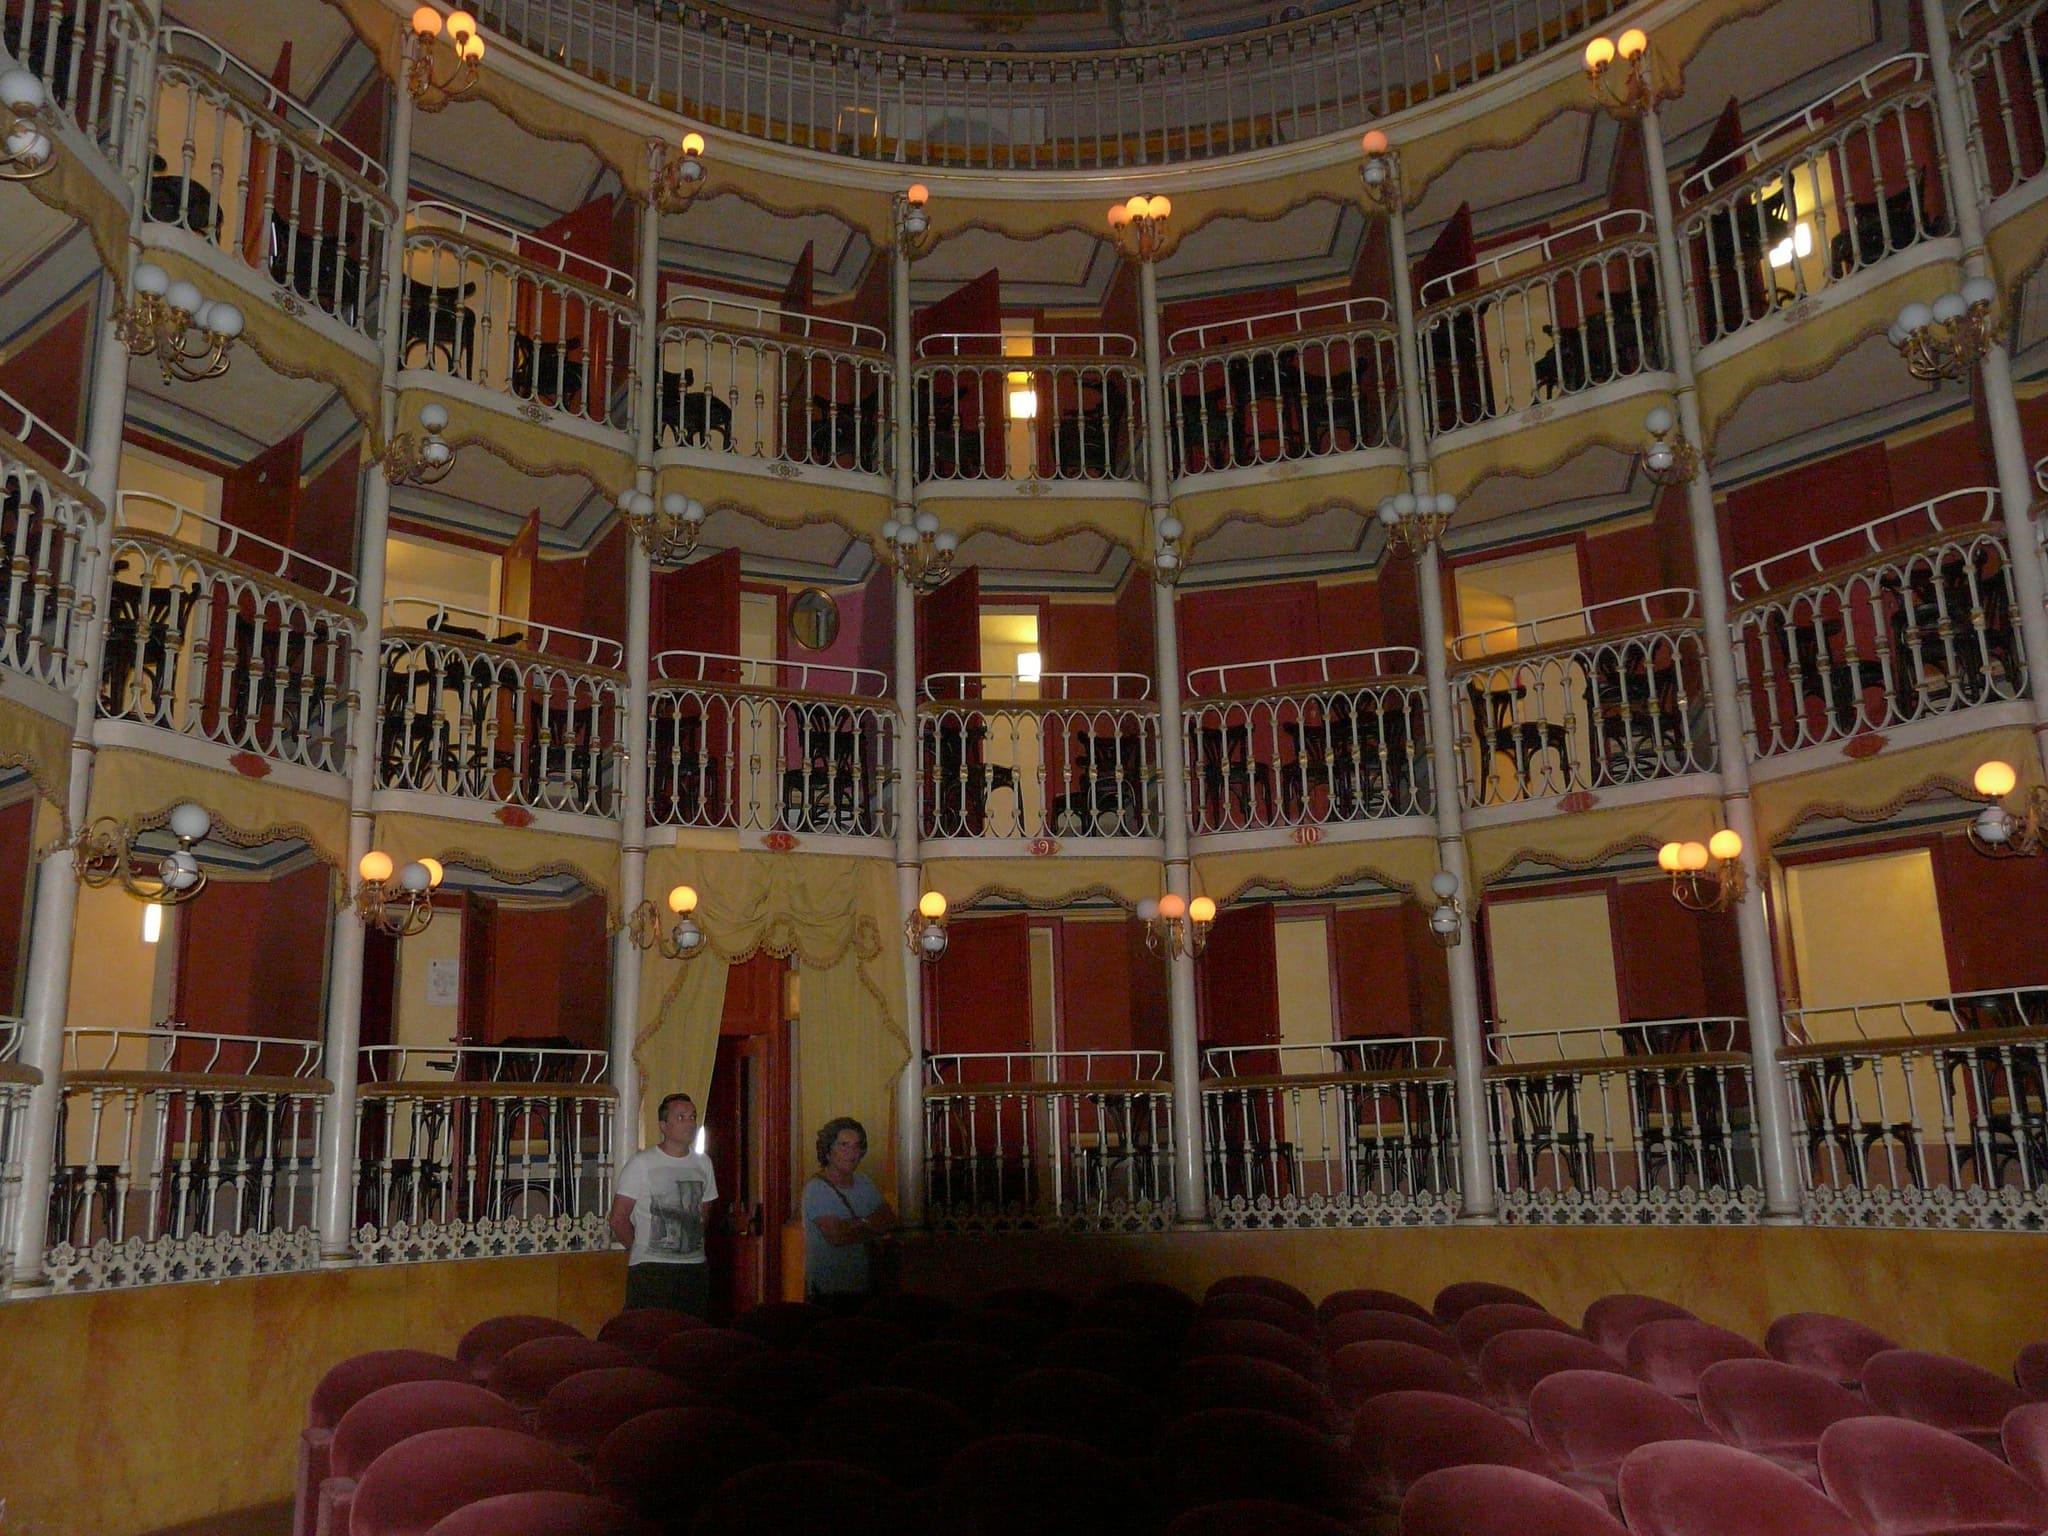 Umbria - teatro della concordia